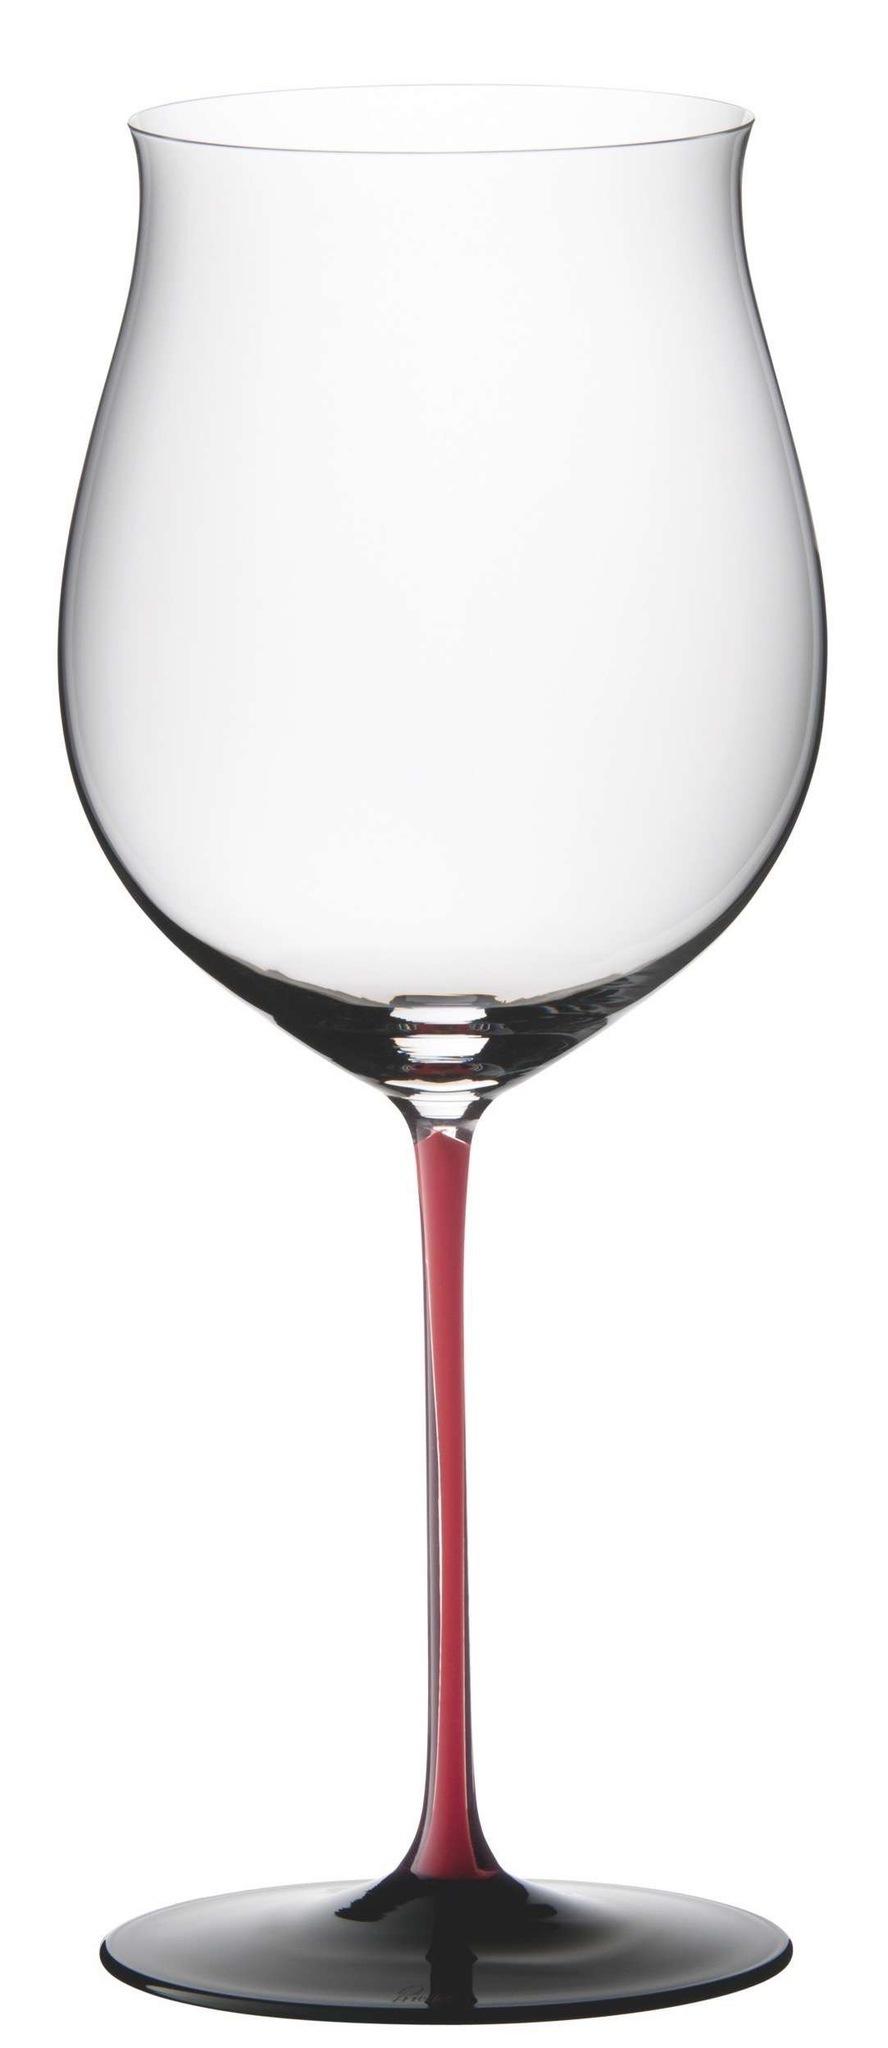 Бокал для вина Riedel BurgundyGrand Cru, Sommeliers Black Series Collector'S Edition, 1050 мл